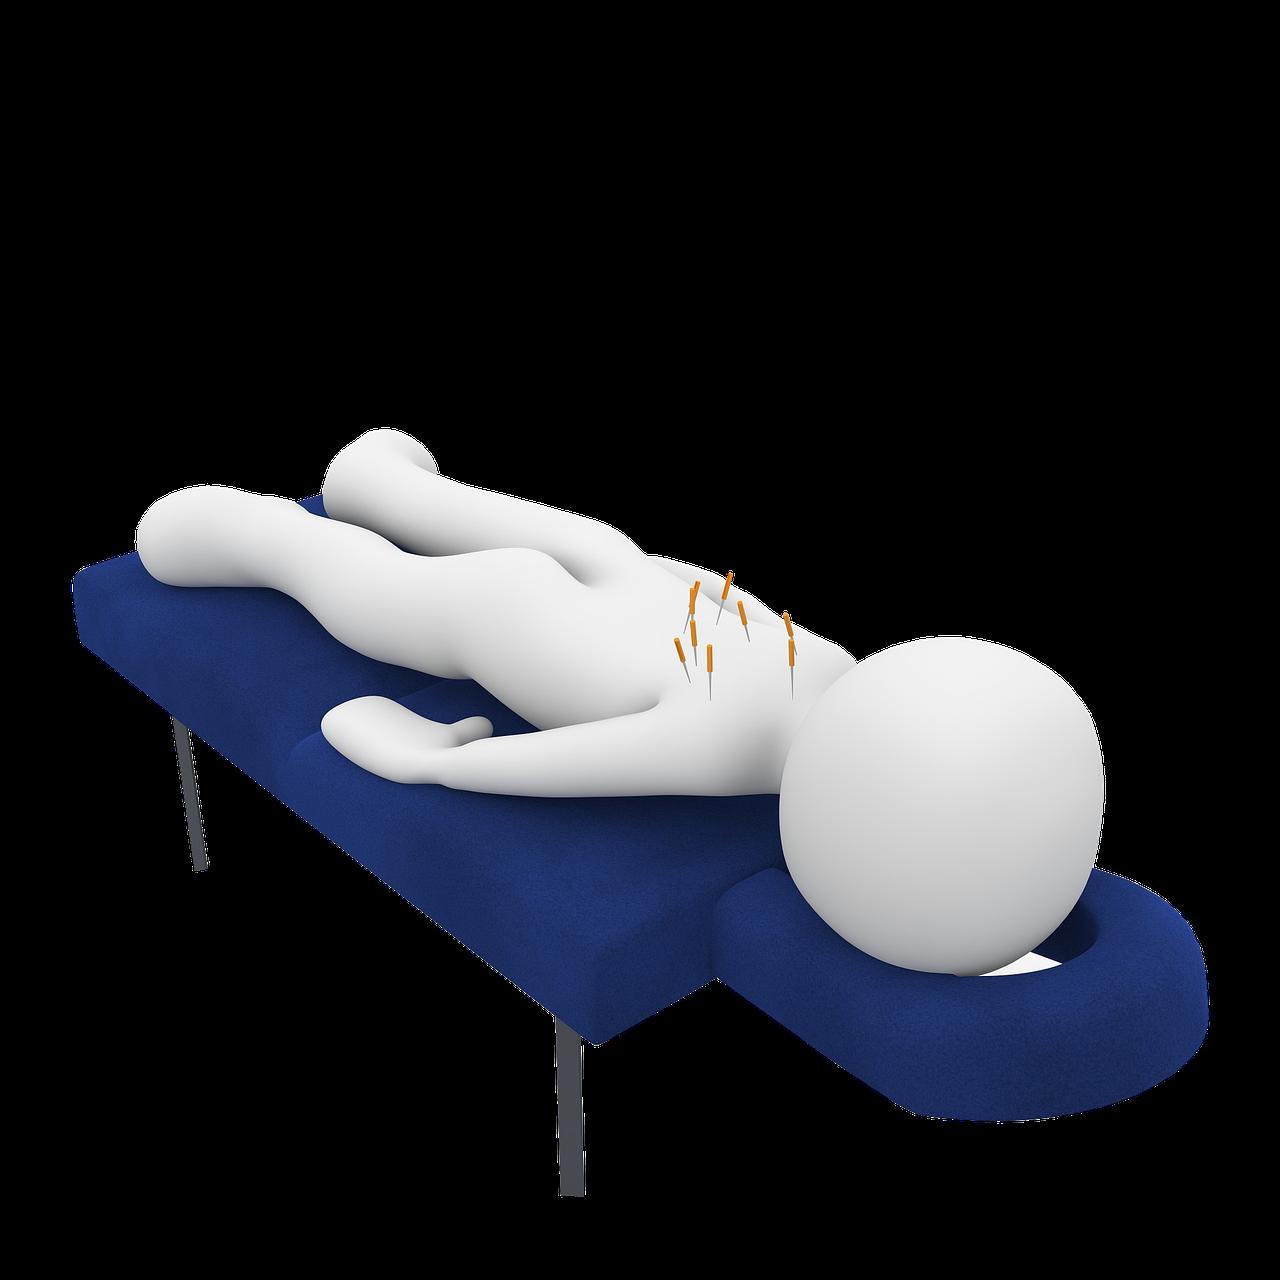 L.C. Zegers fysiotherapeut opleiding